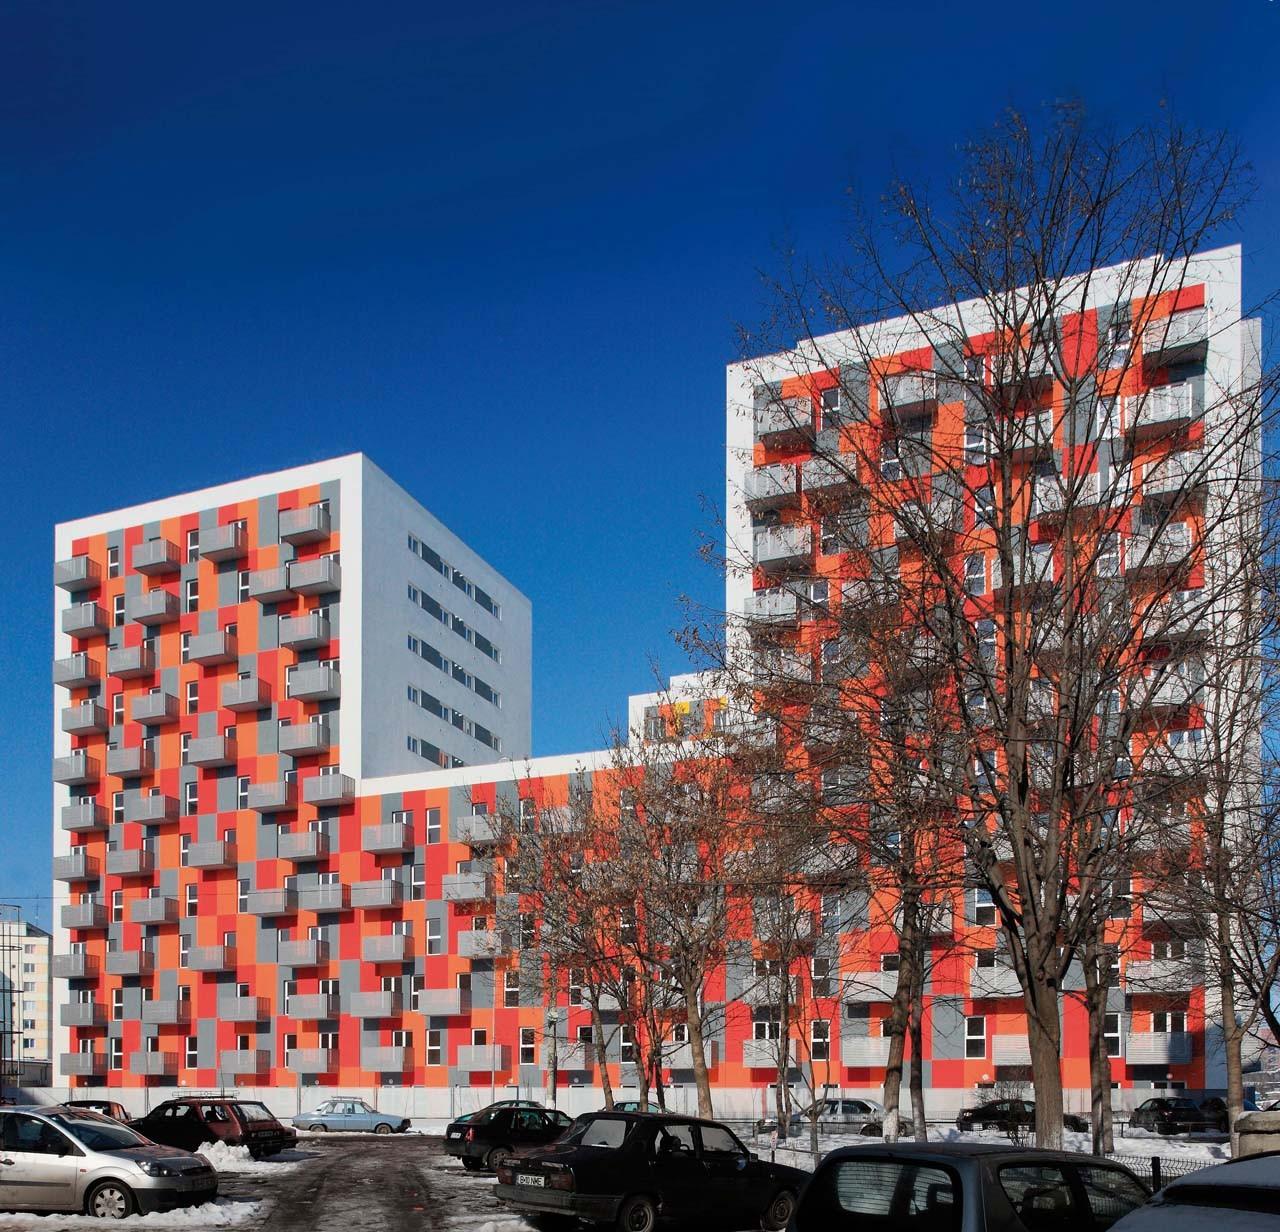 High Density Residential Building / Solano & Catalán + Elena Saricu, © Andrei Mârgulescu